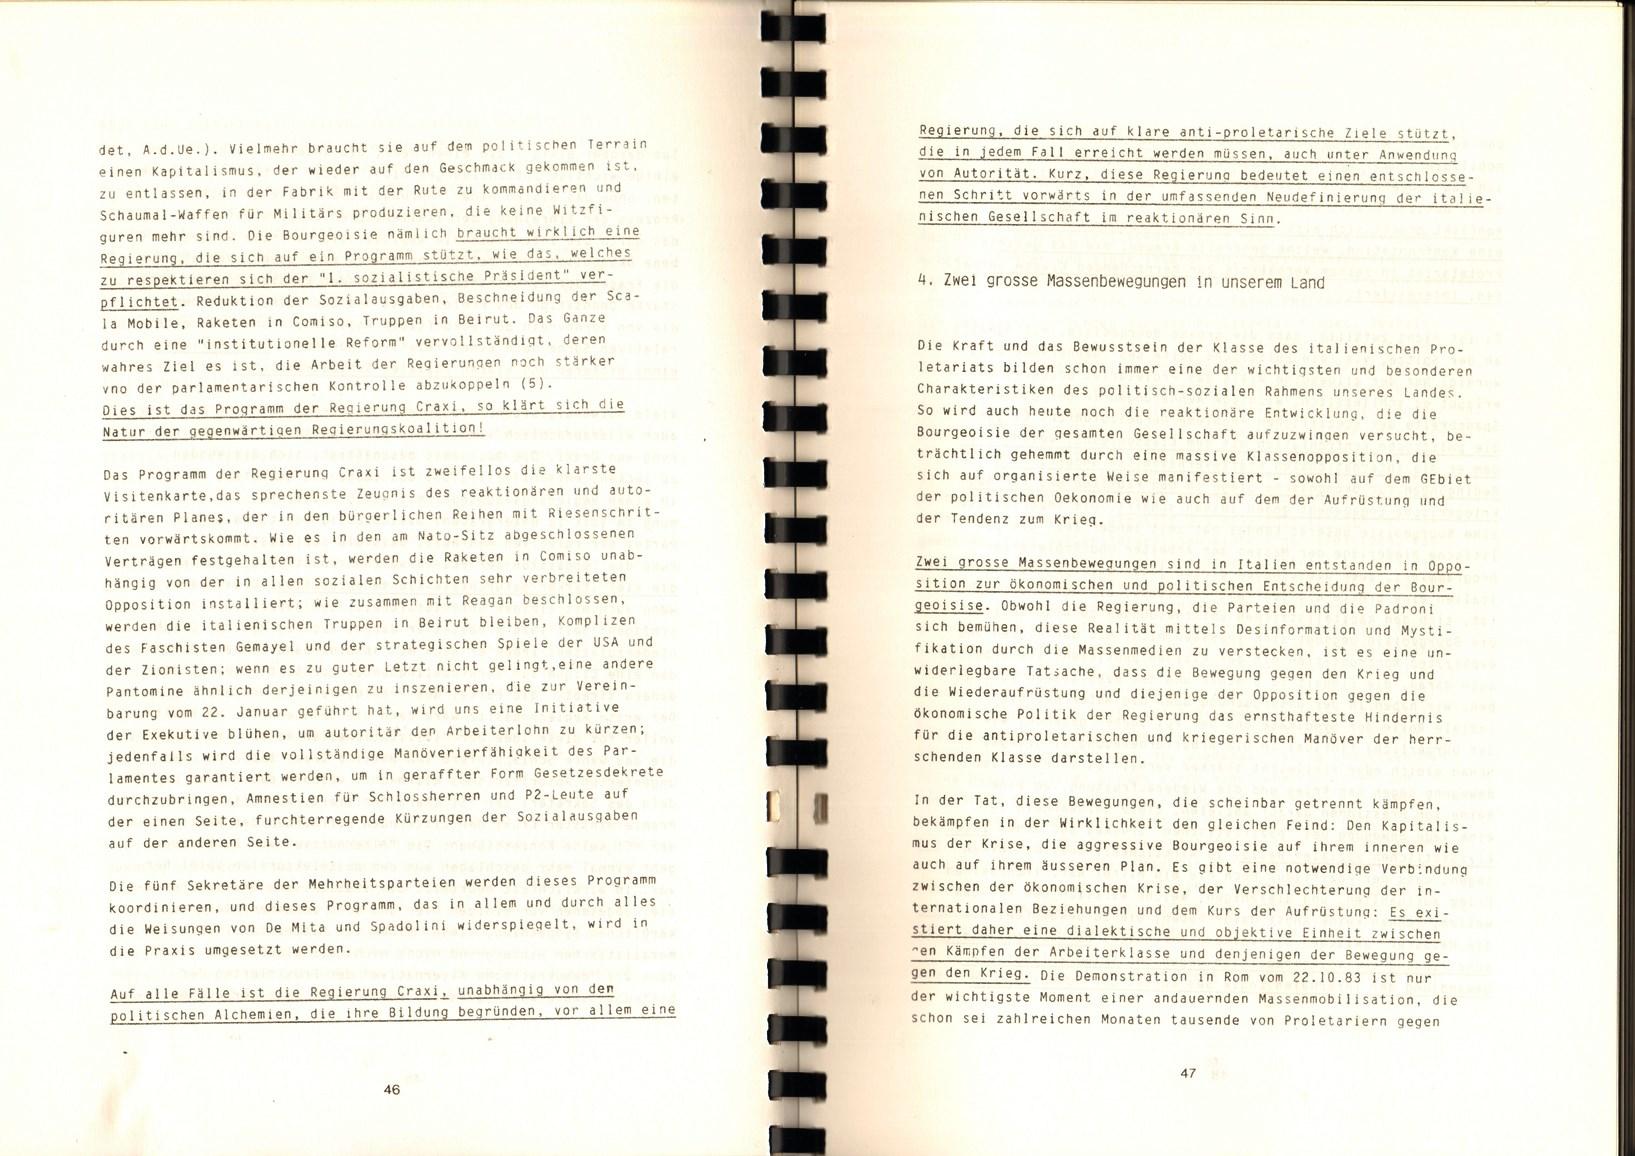 Internationale_Debatte_1985_Brigate_Rosse_025